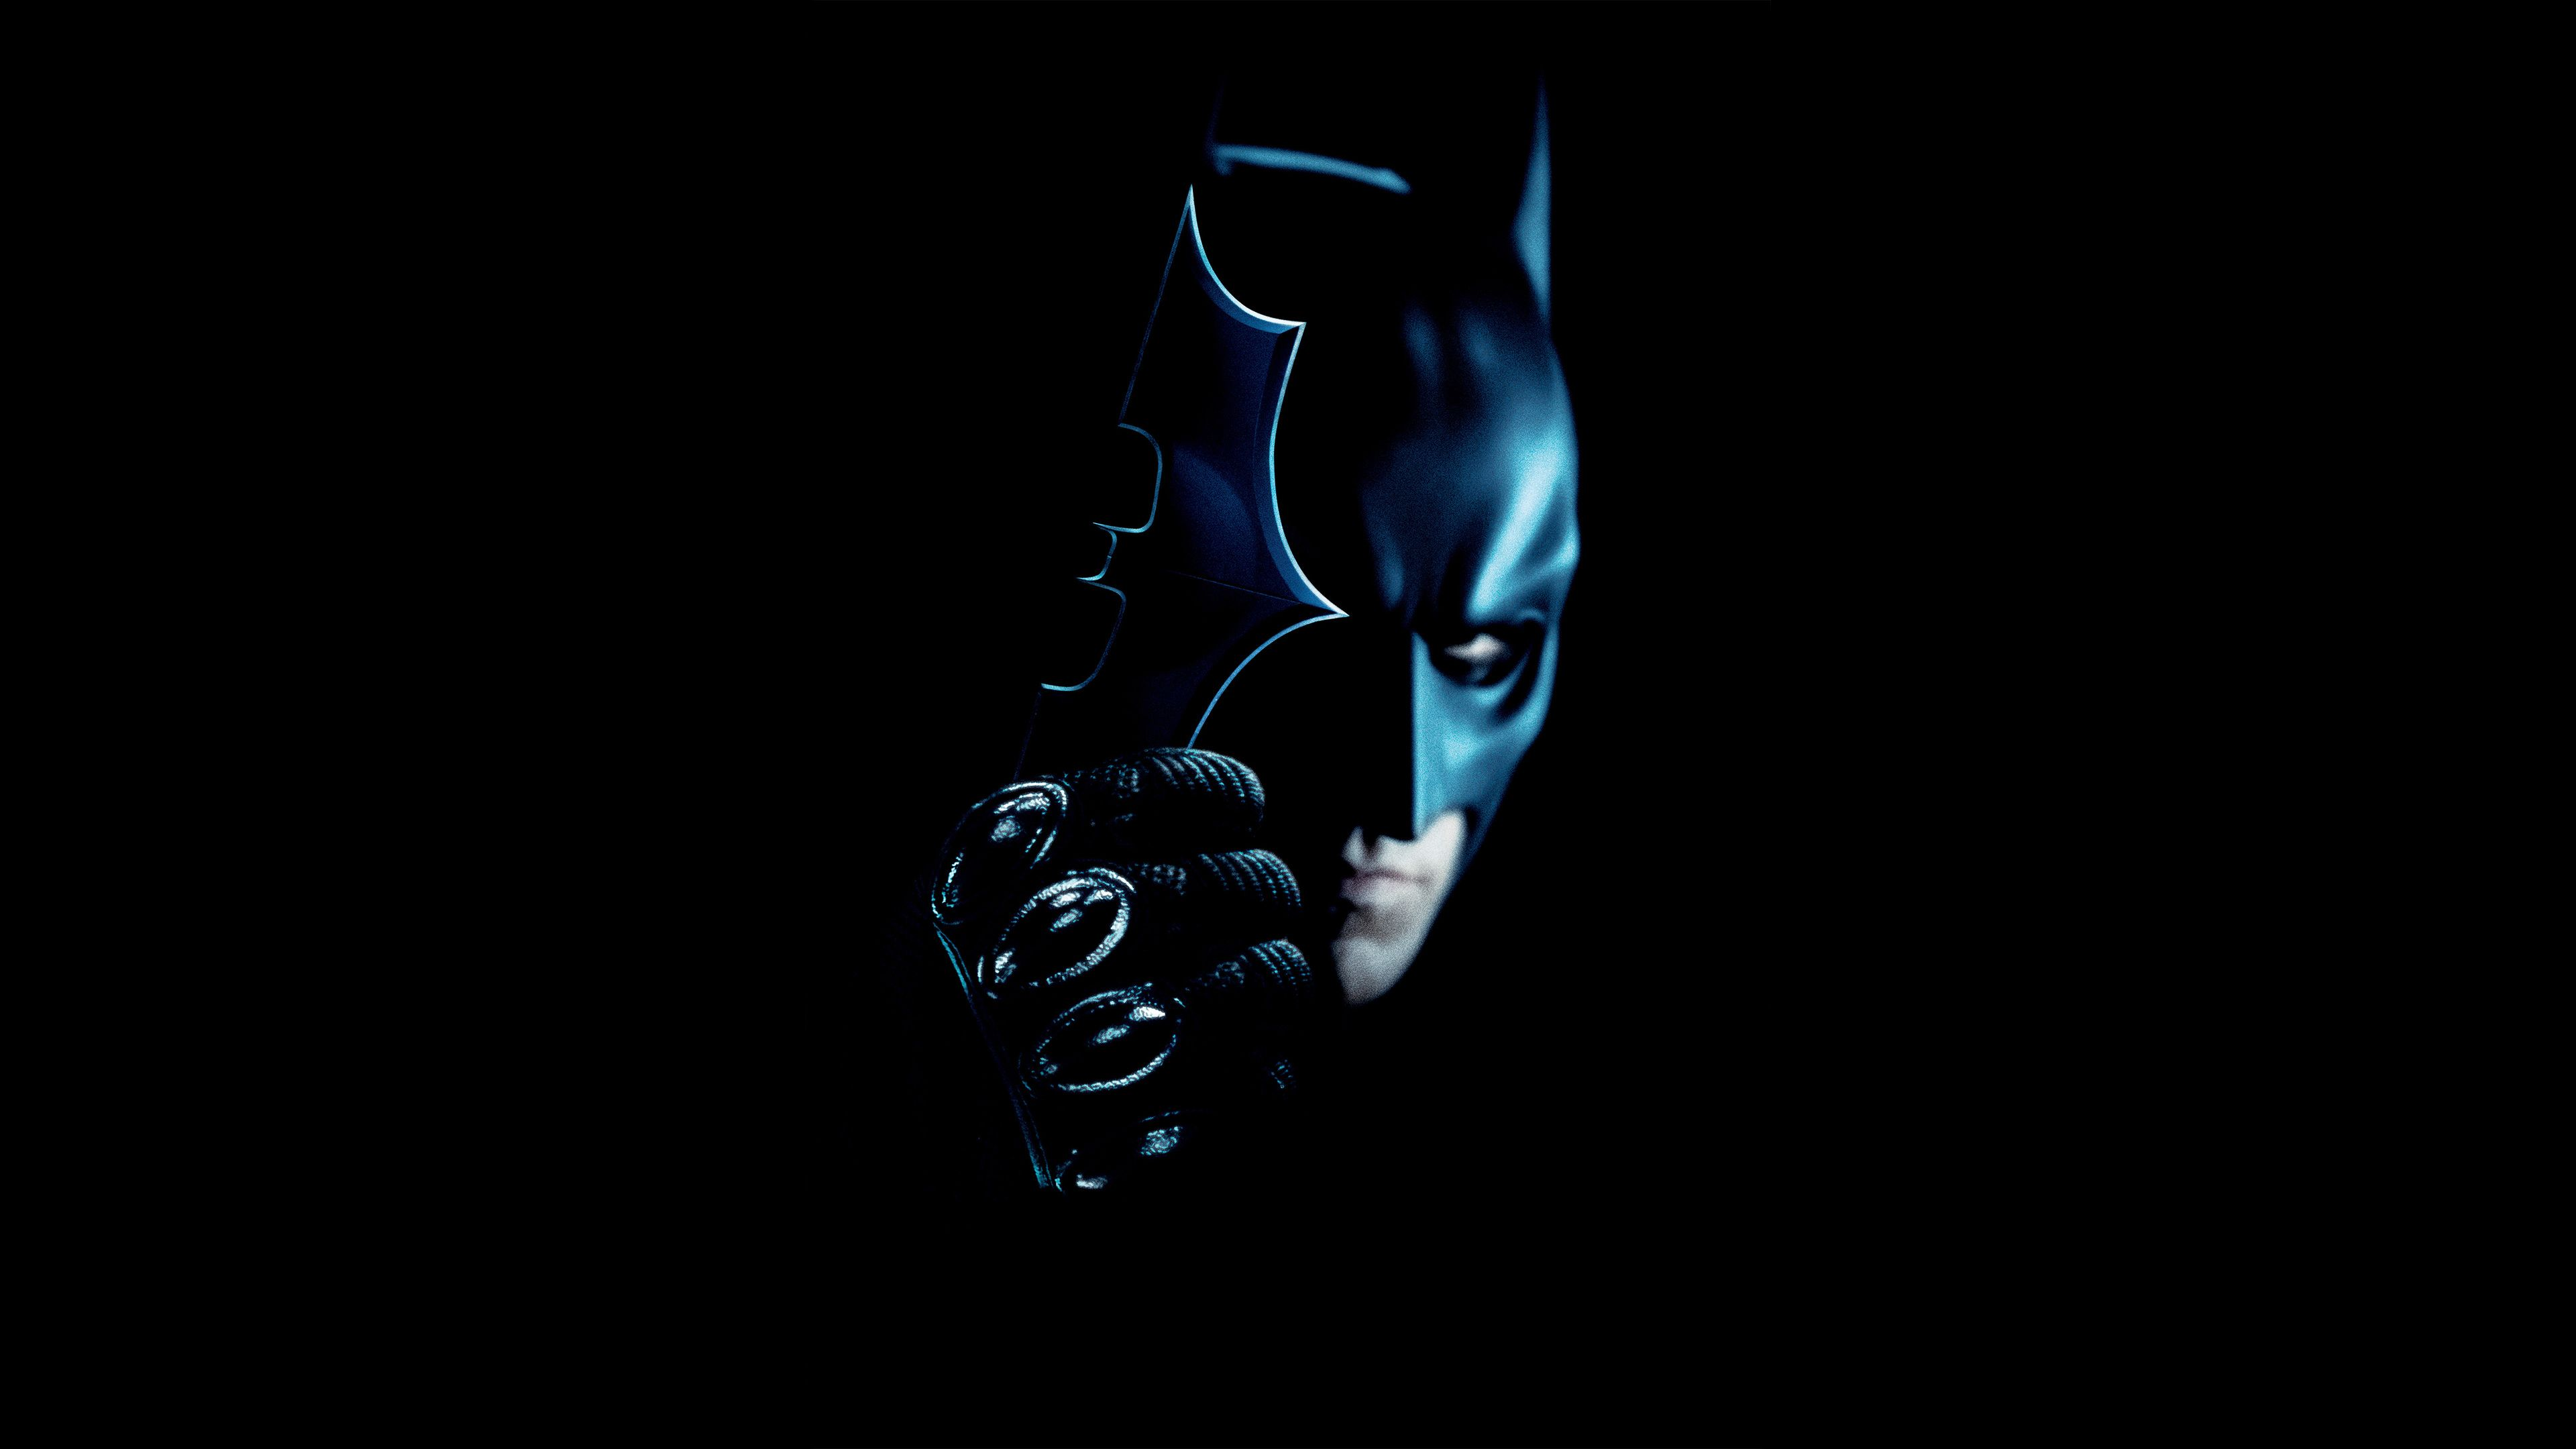 The Dark Knight 5k Superheroes Wallpapers Movies Wallpapers Hd Wallpapers Batman Wallpapers 5k Wallpa Batman Wallpaper Superhero Wallpaper Movie Wallpapers